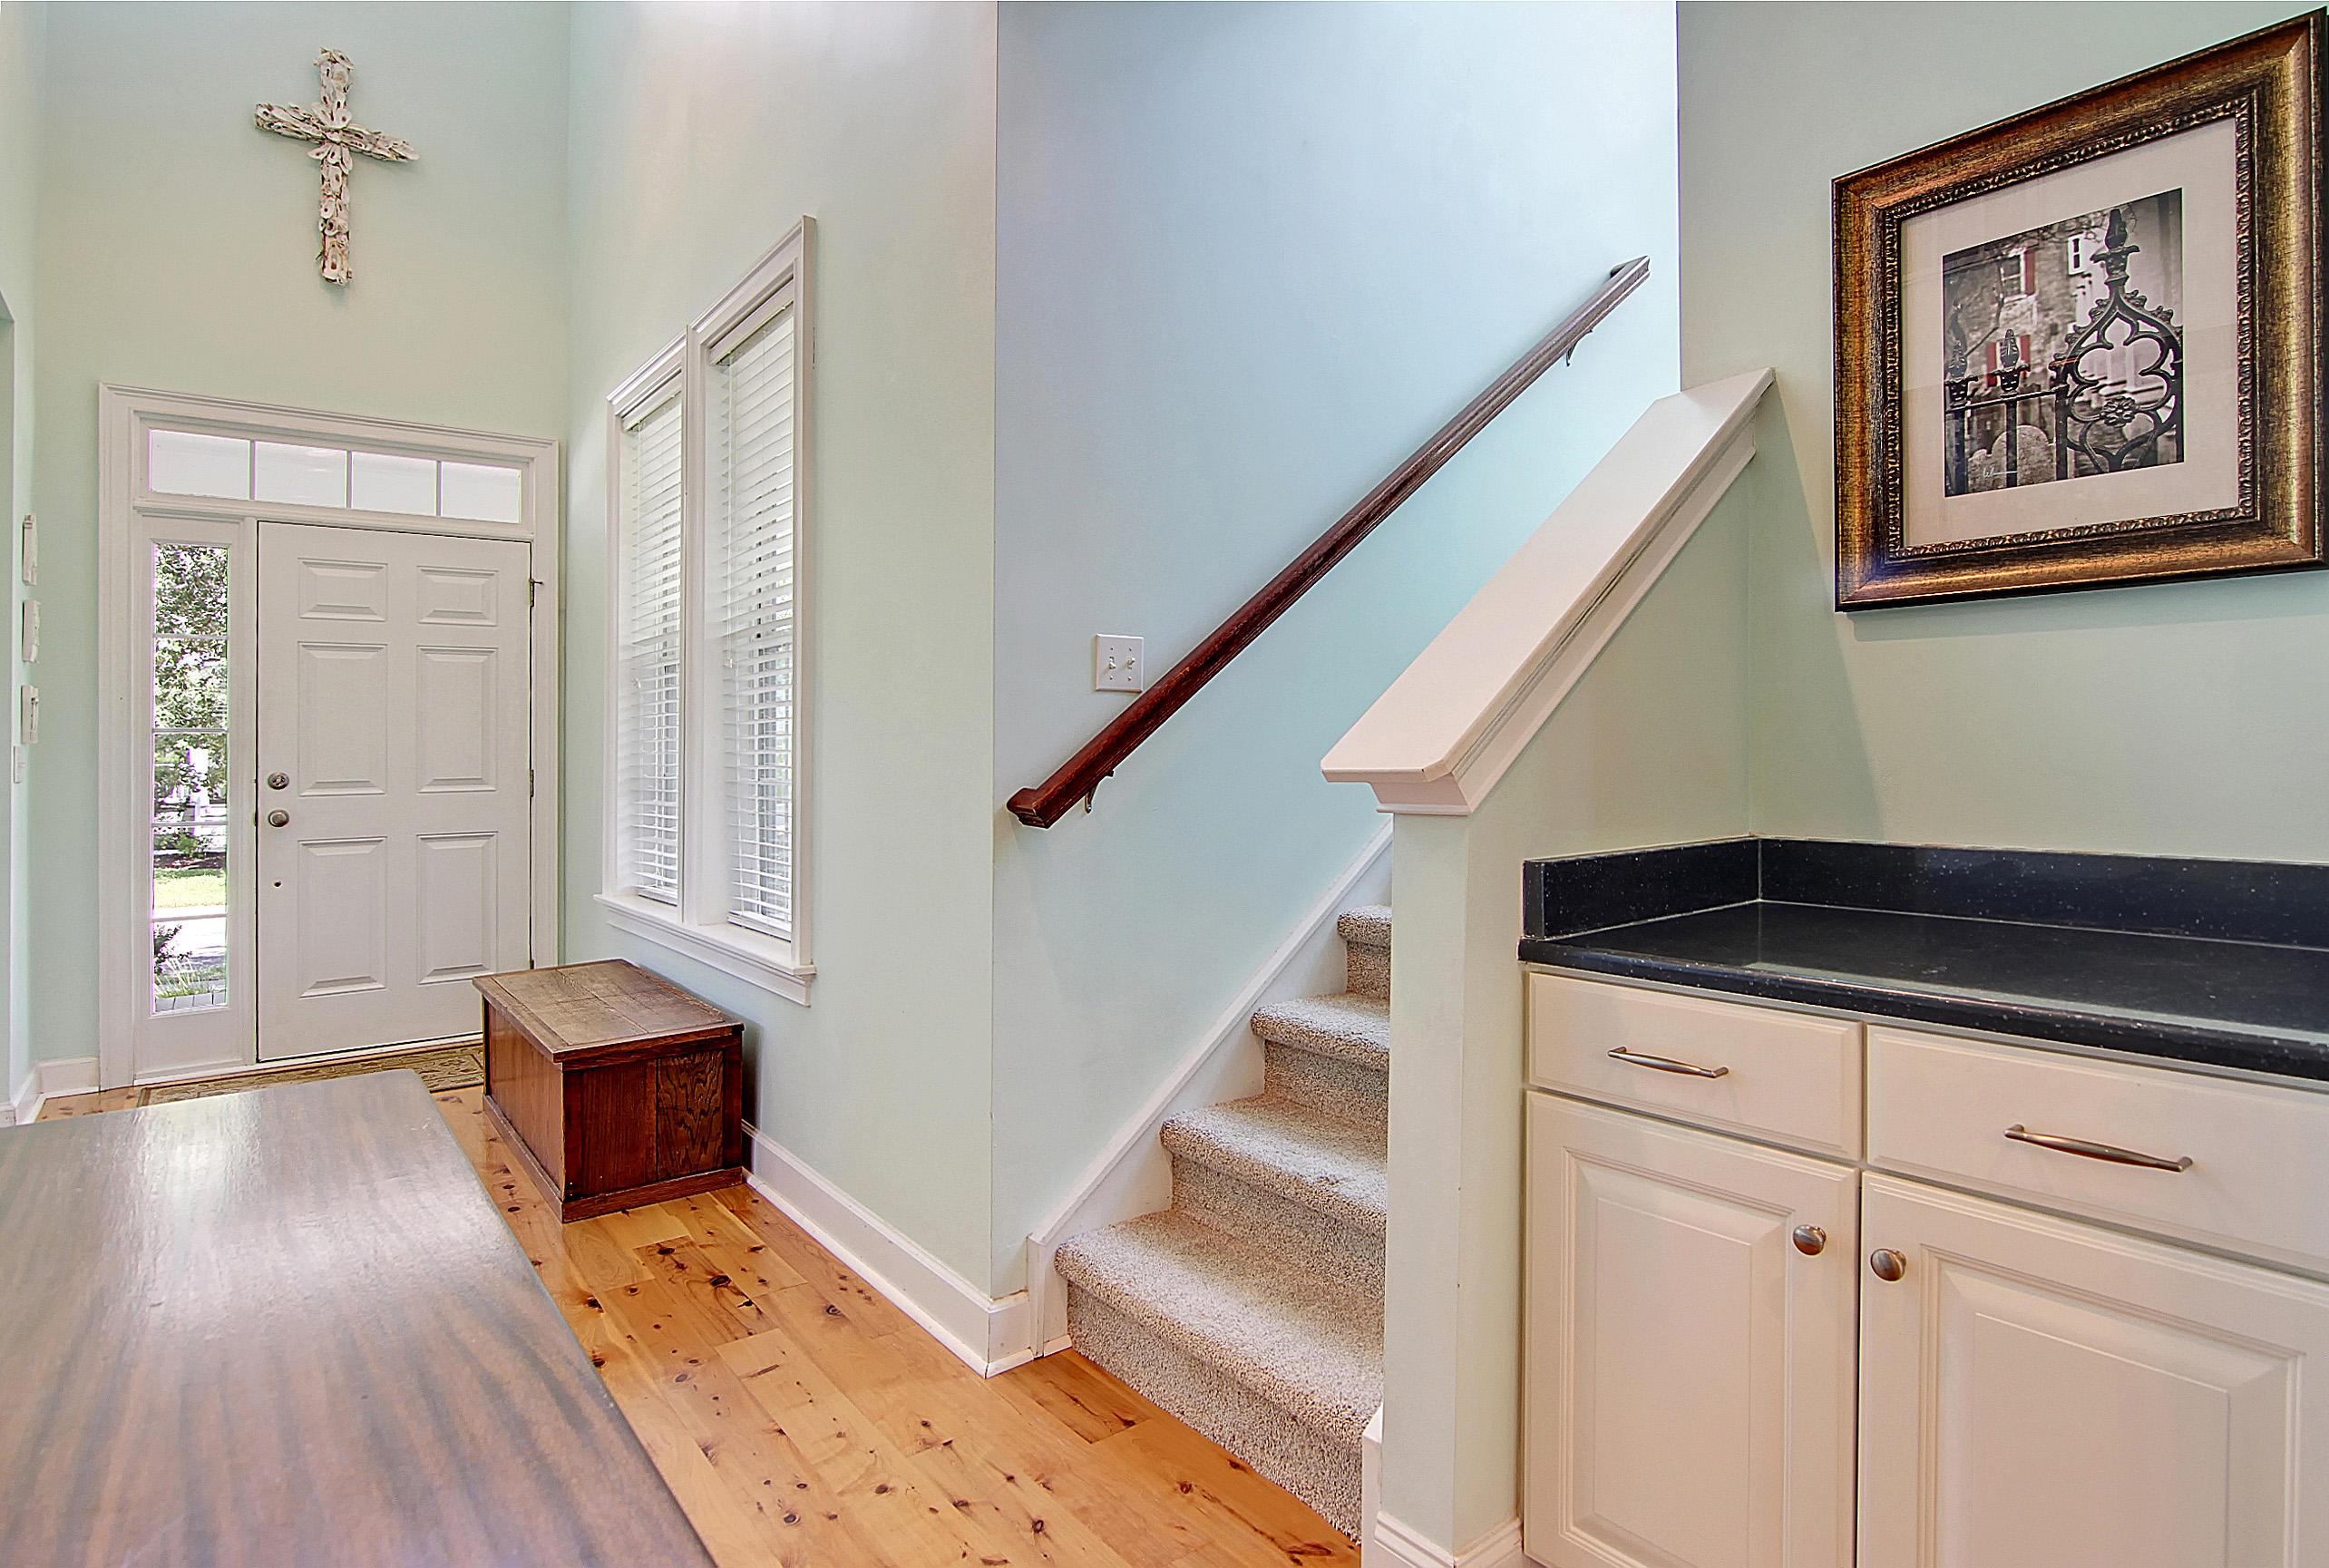 Park West Homes For Sale - 1856 Hall Point, Mount Pleasant, SC - 11